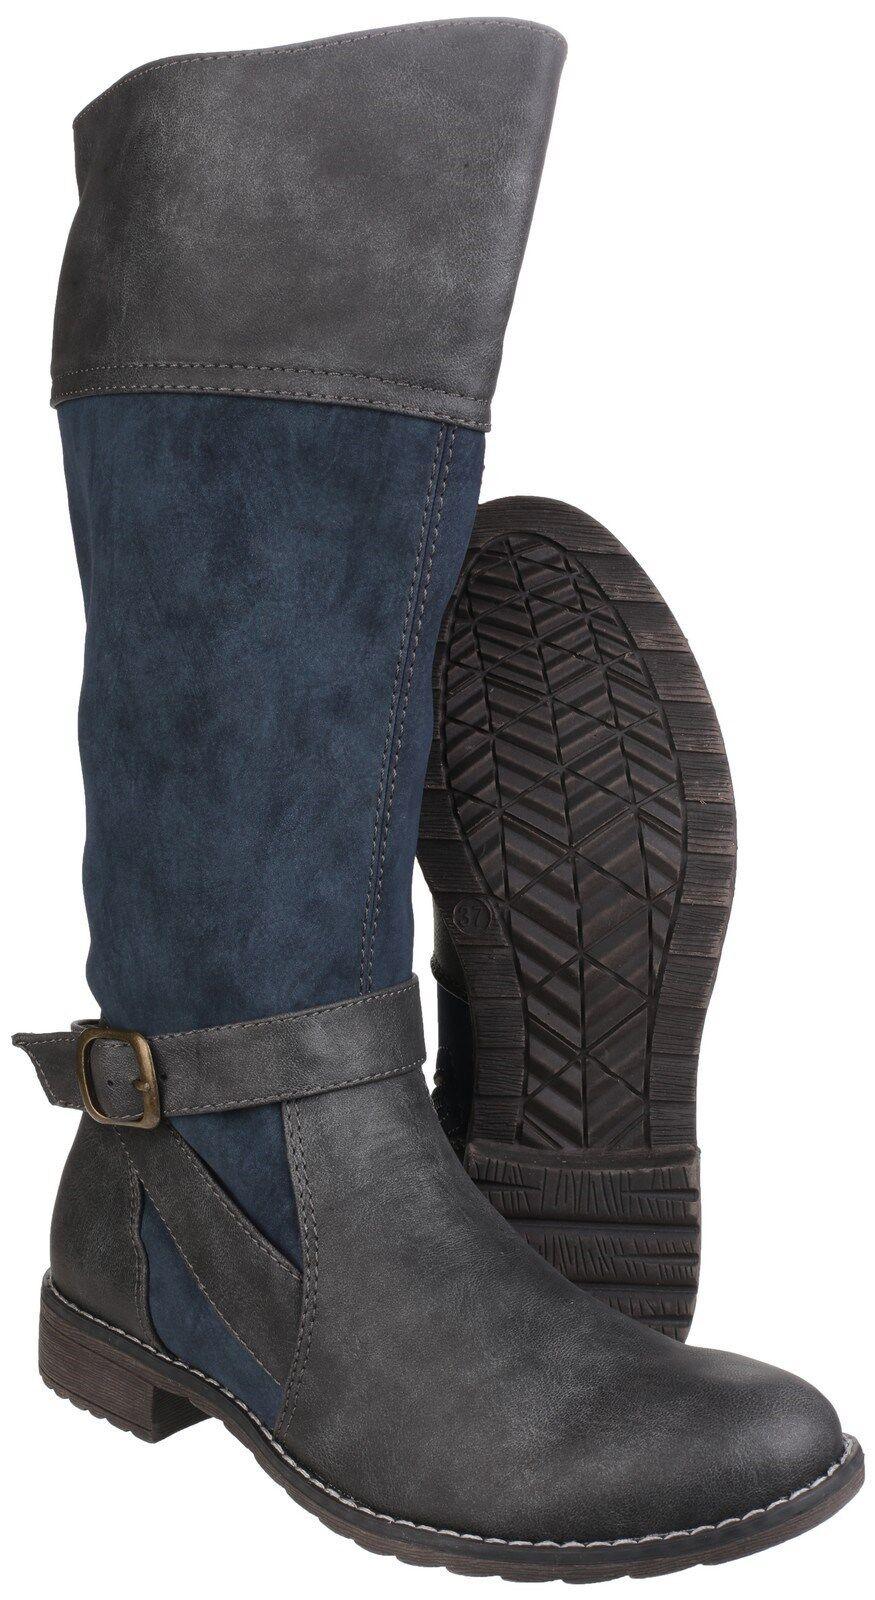 Divaz Garbo Knee High Zip Up Damenschuhe Two Toned Fashion Stiefel Schuhes UK3-8